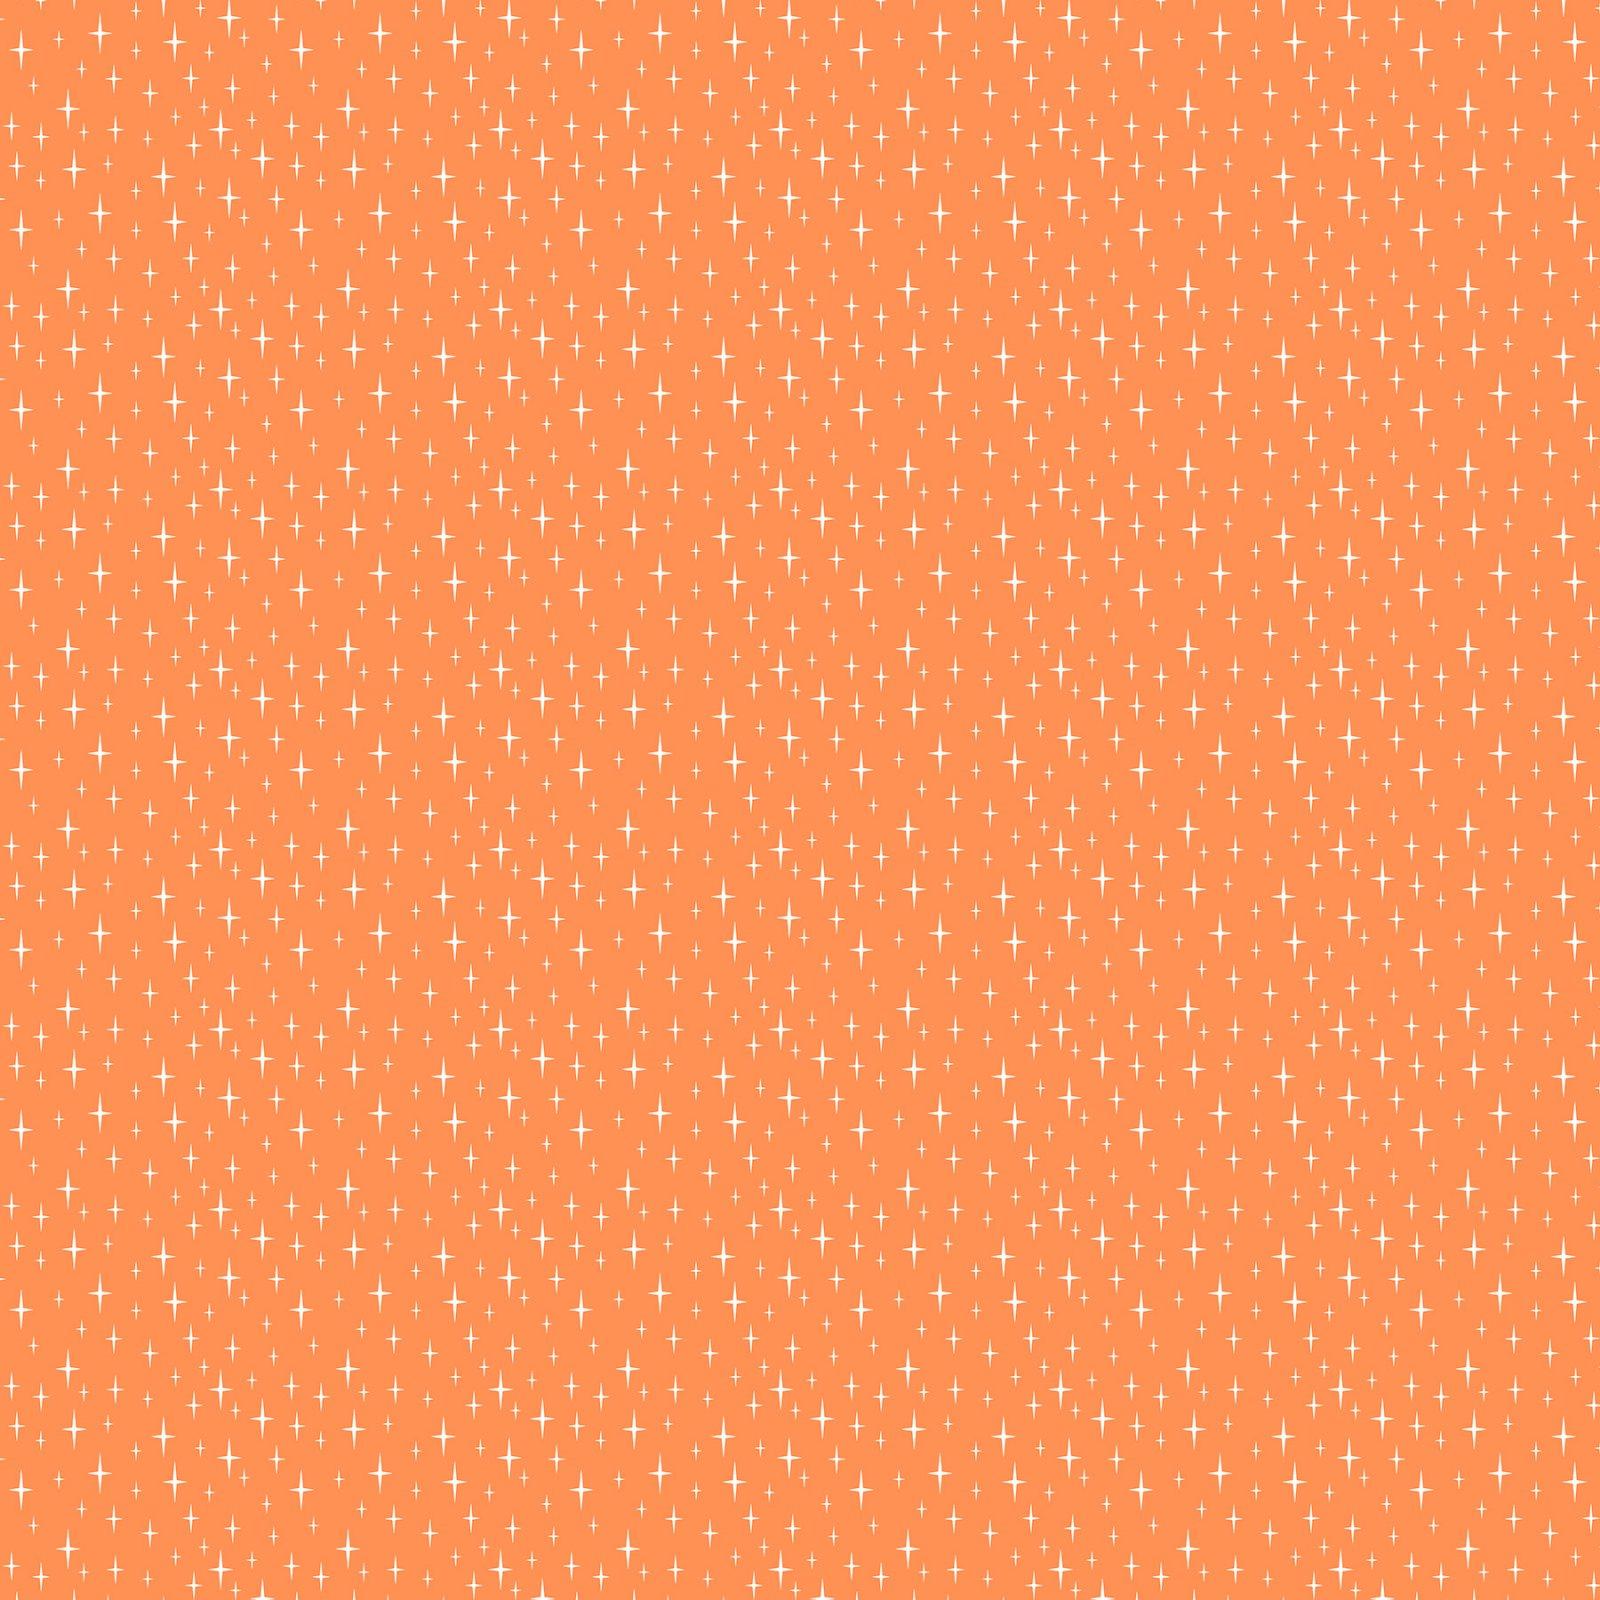 Butterscotch Starlight Orange